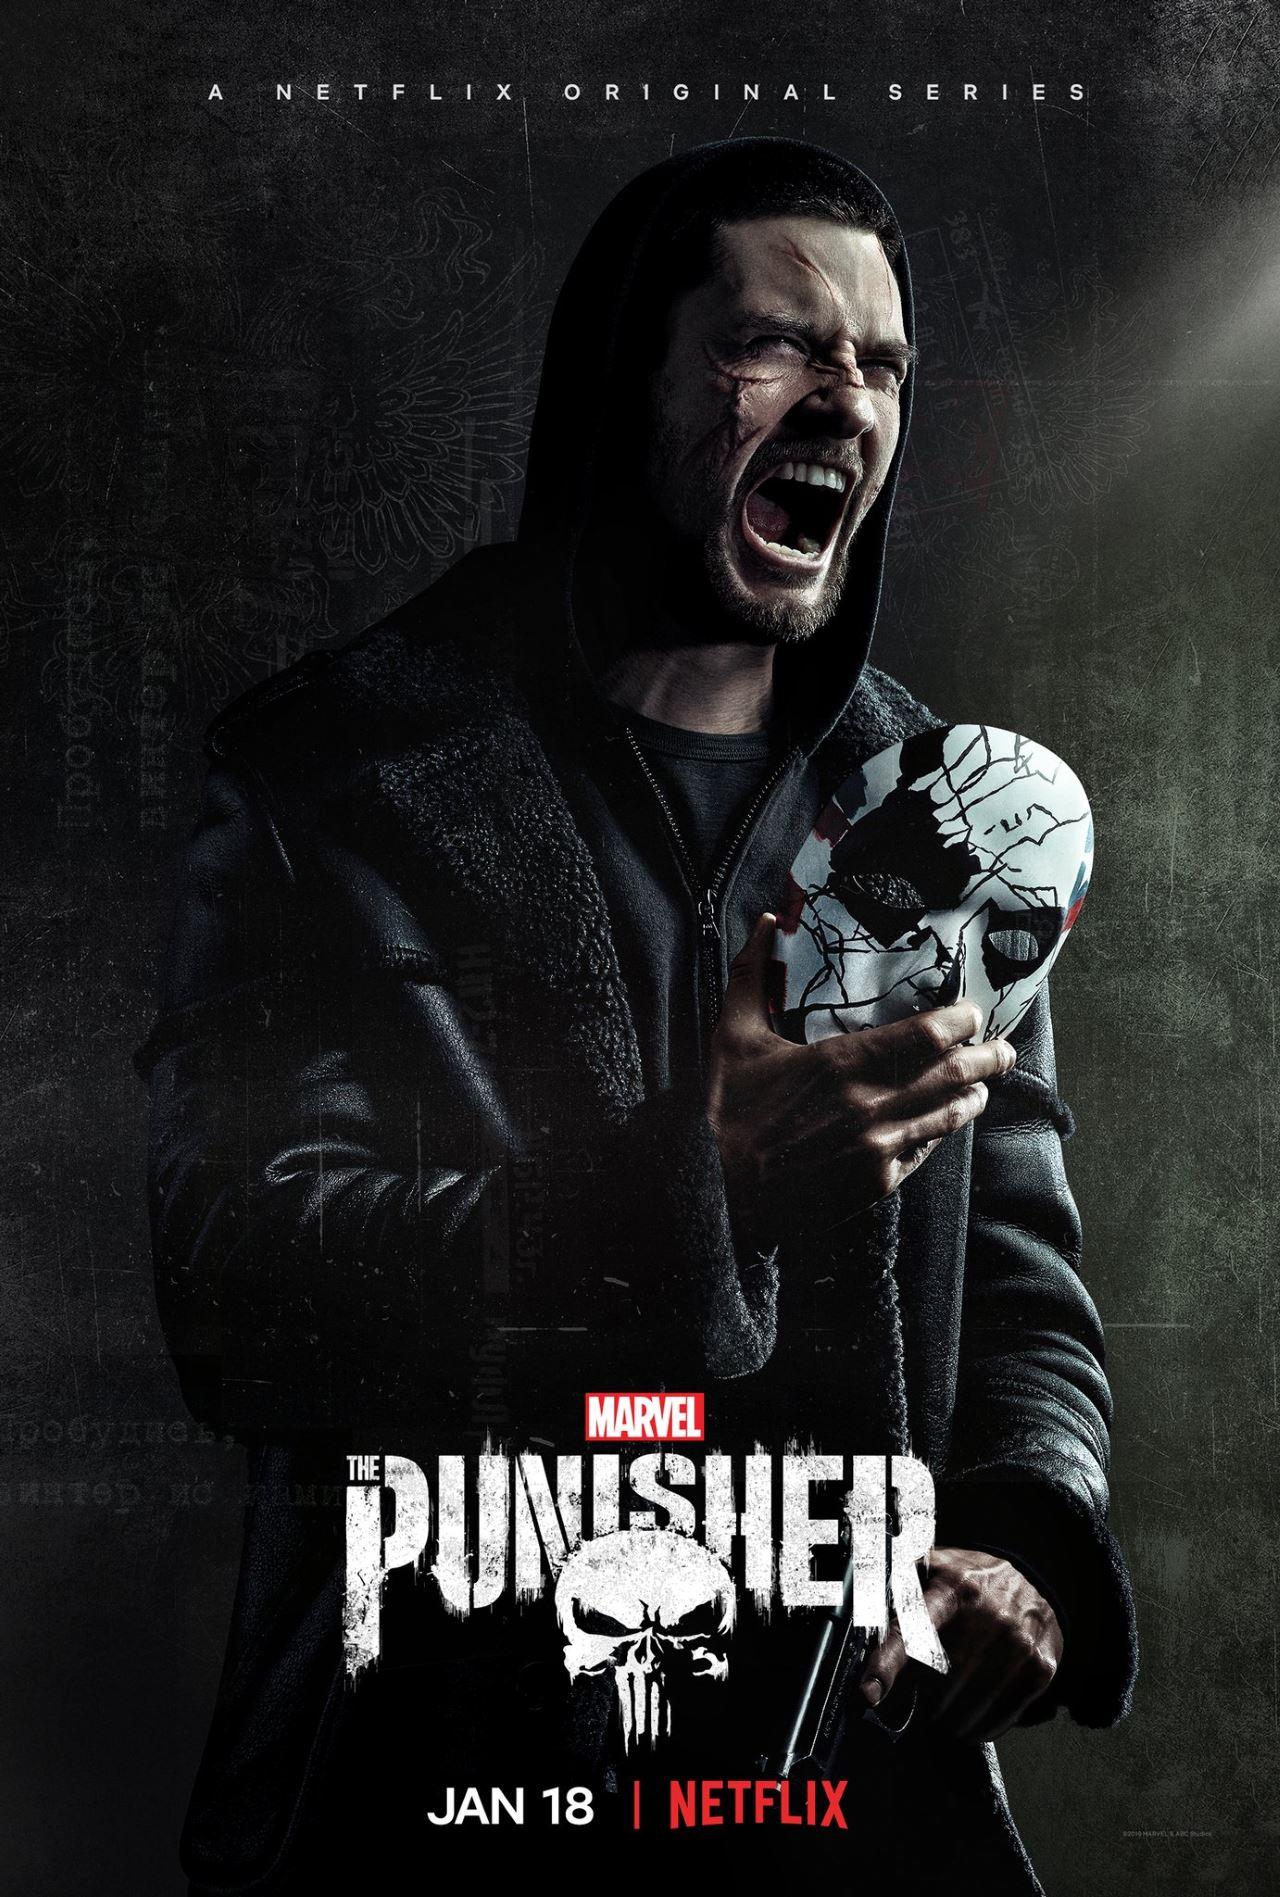 the punisher season 2 poster jigsaw The Punisher season 2